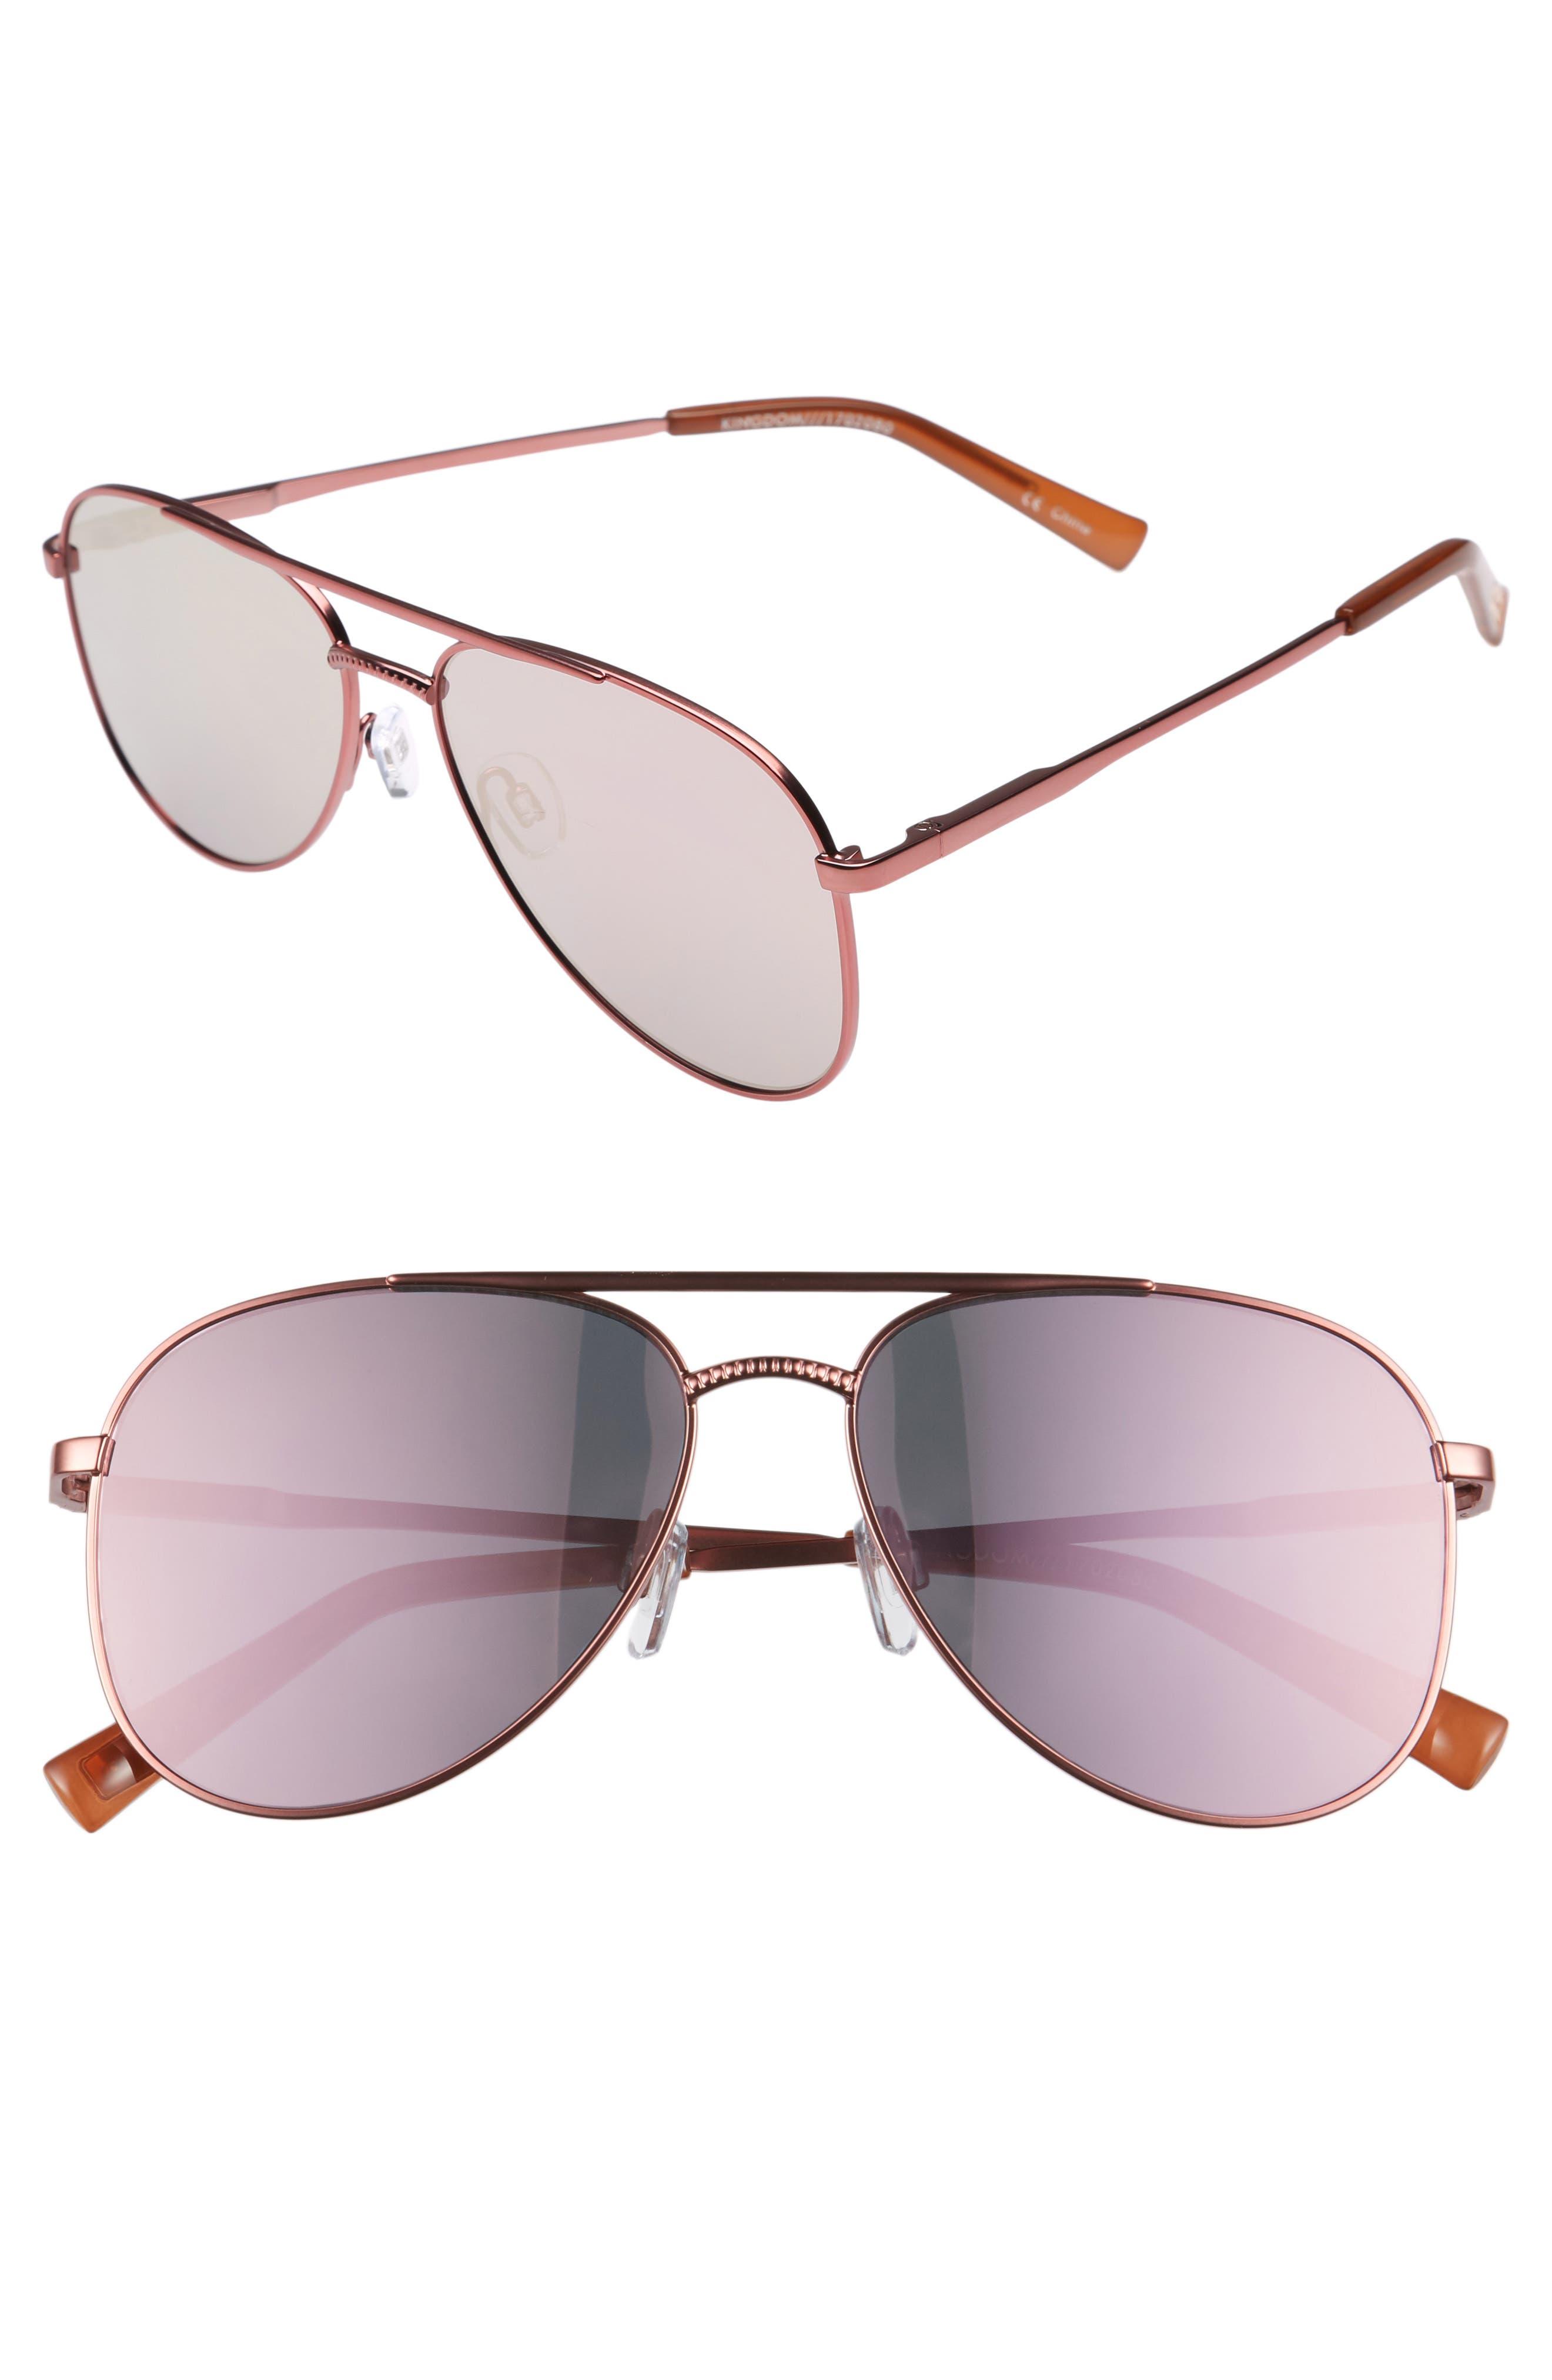 Kingdom 57mm Polarized Aviator Sunglasses,                             Main thumbnail 1, color,                             650